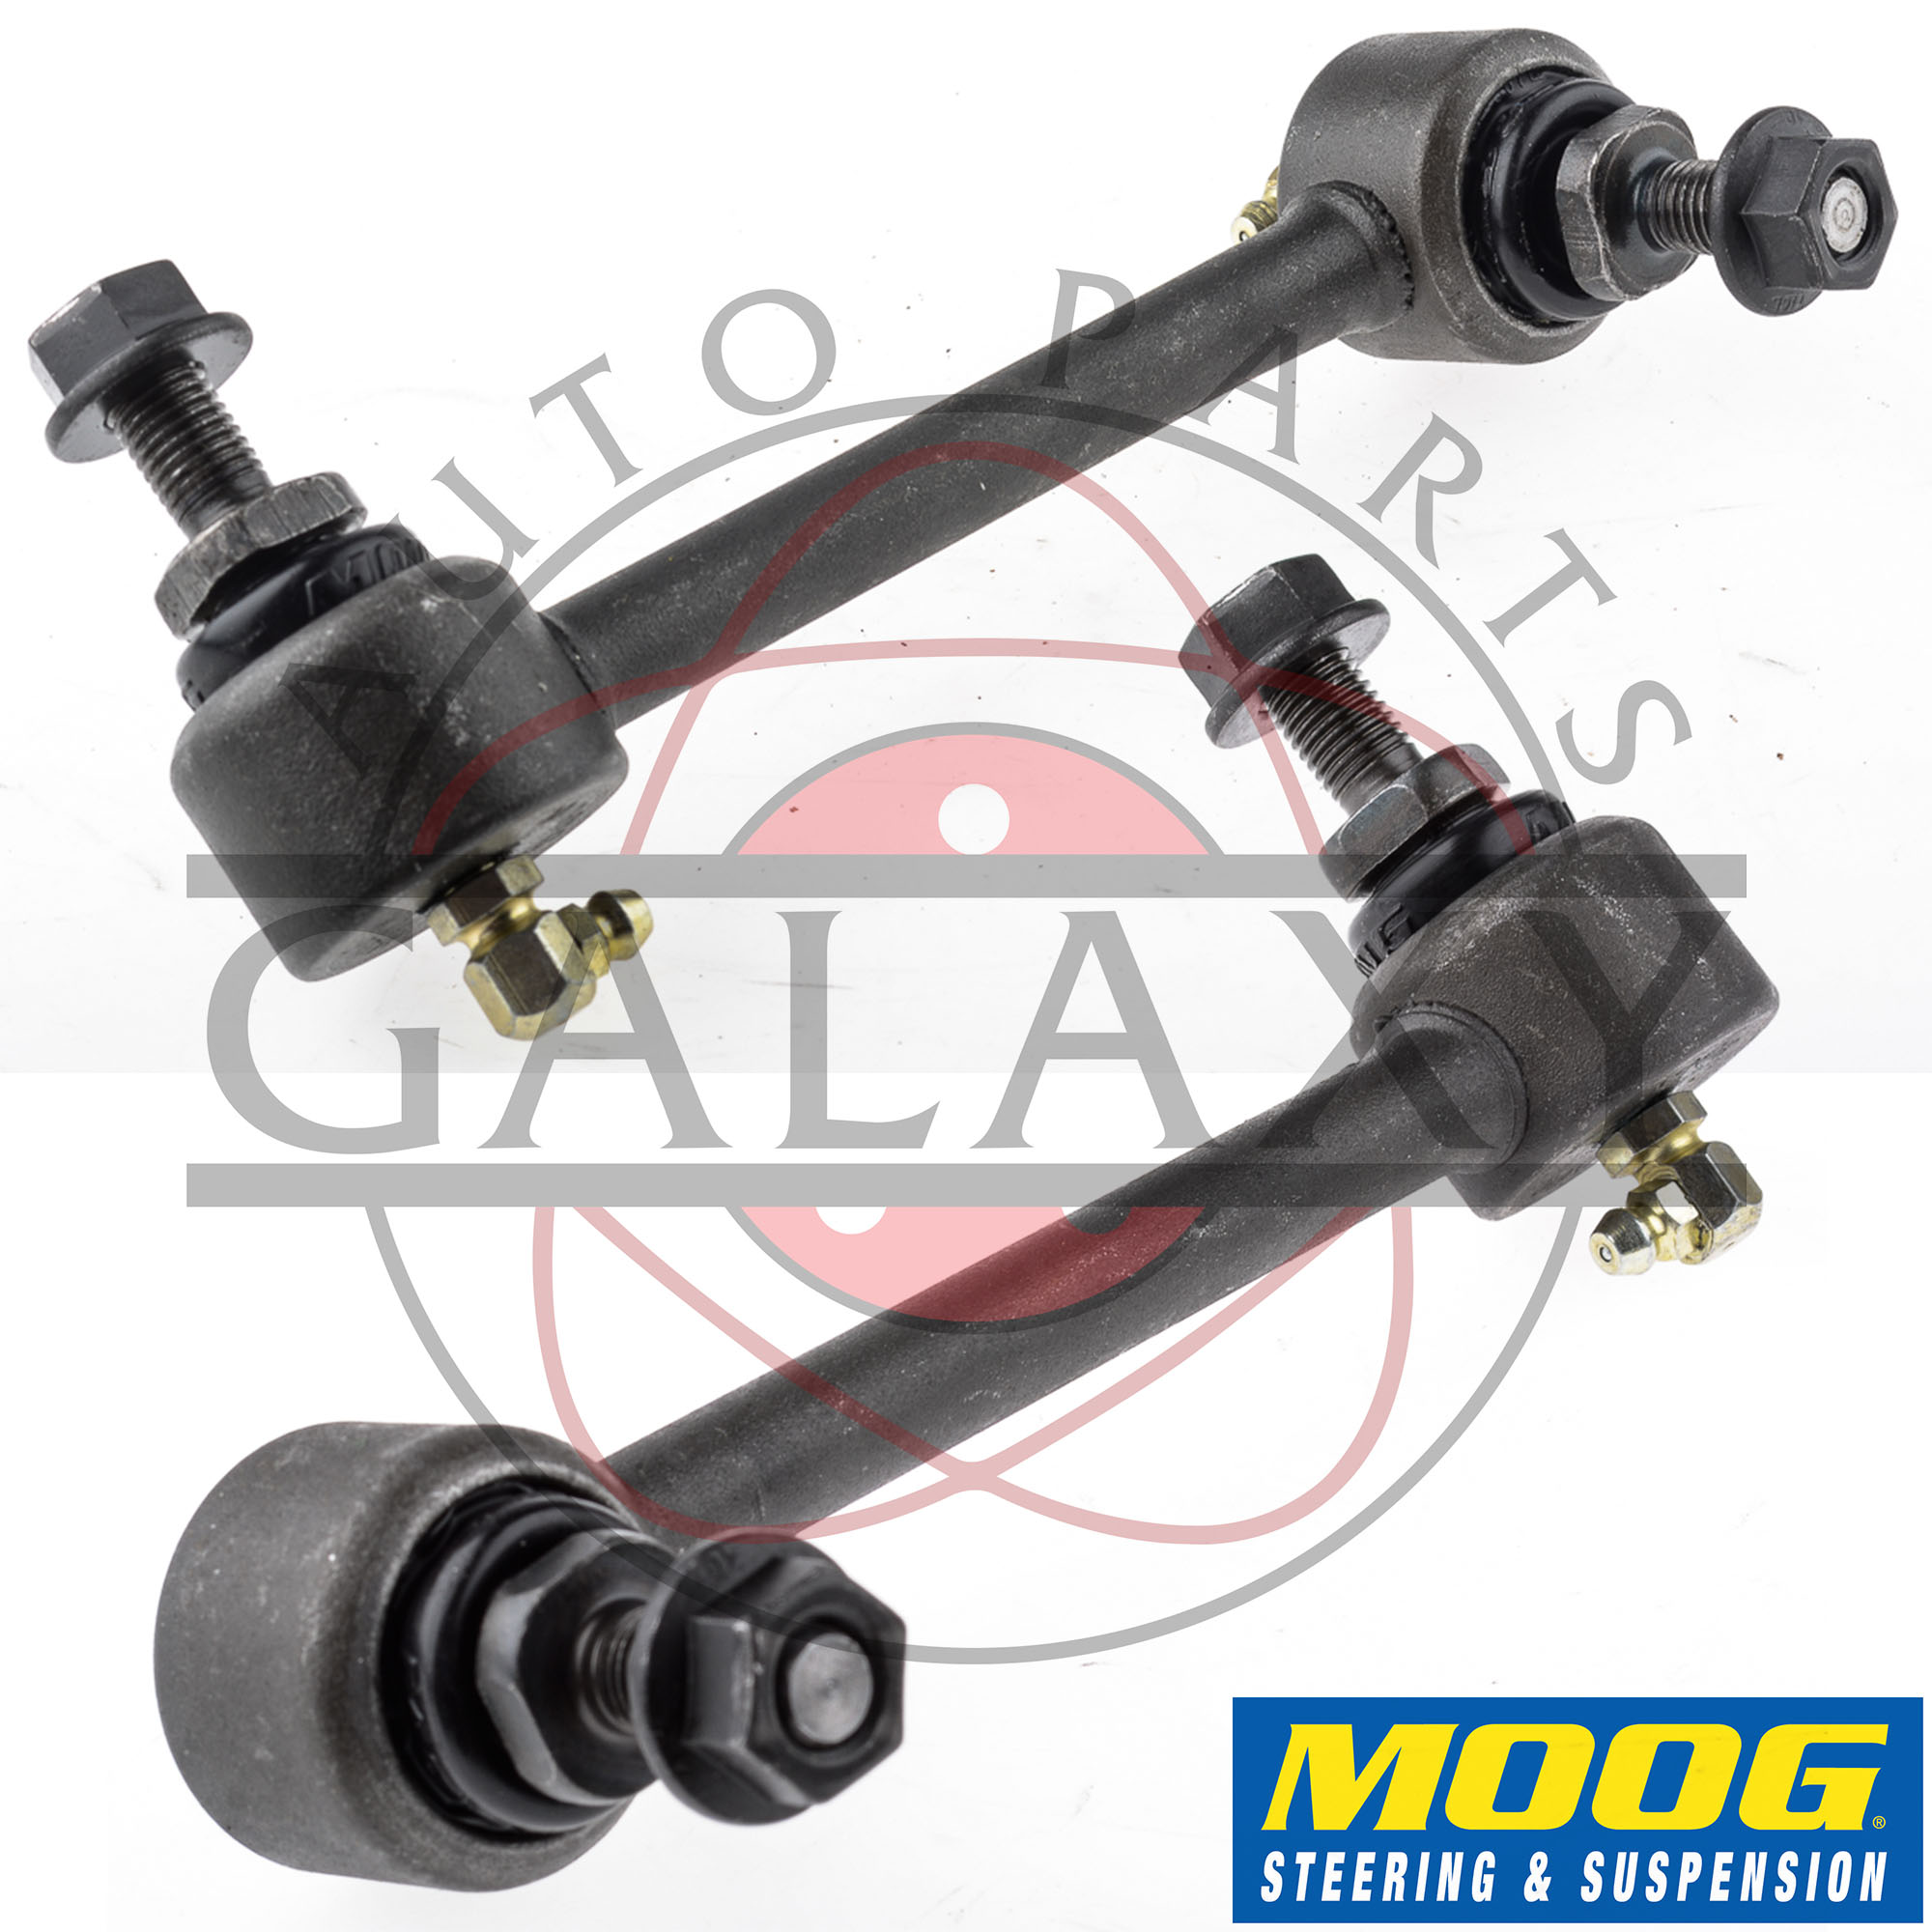 moog new rear sway bar links pair for acura mdx 01 06 honda pilot